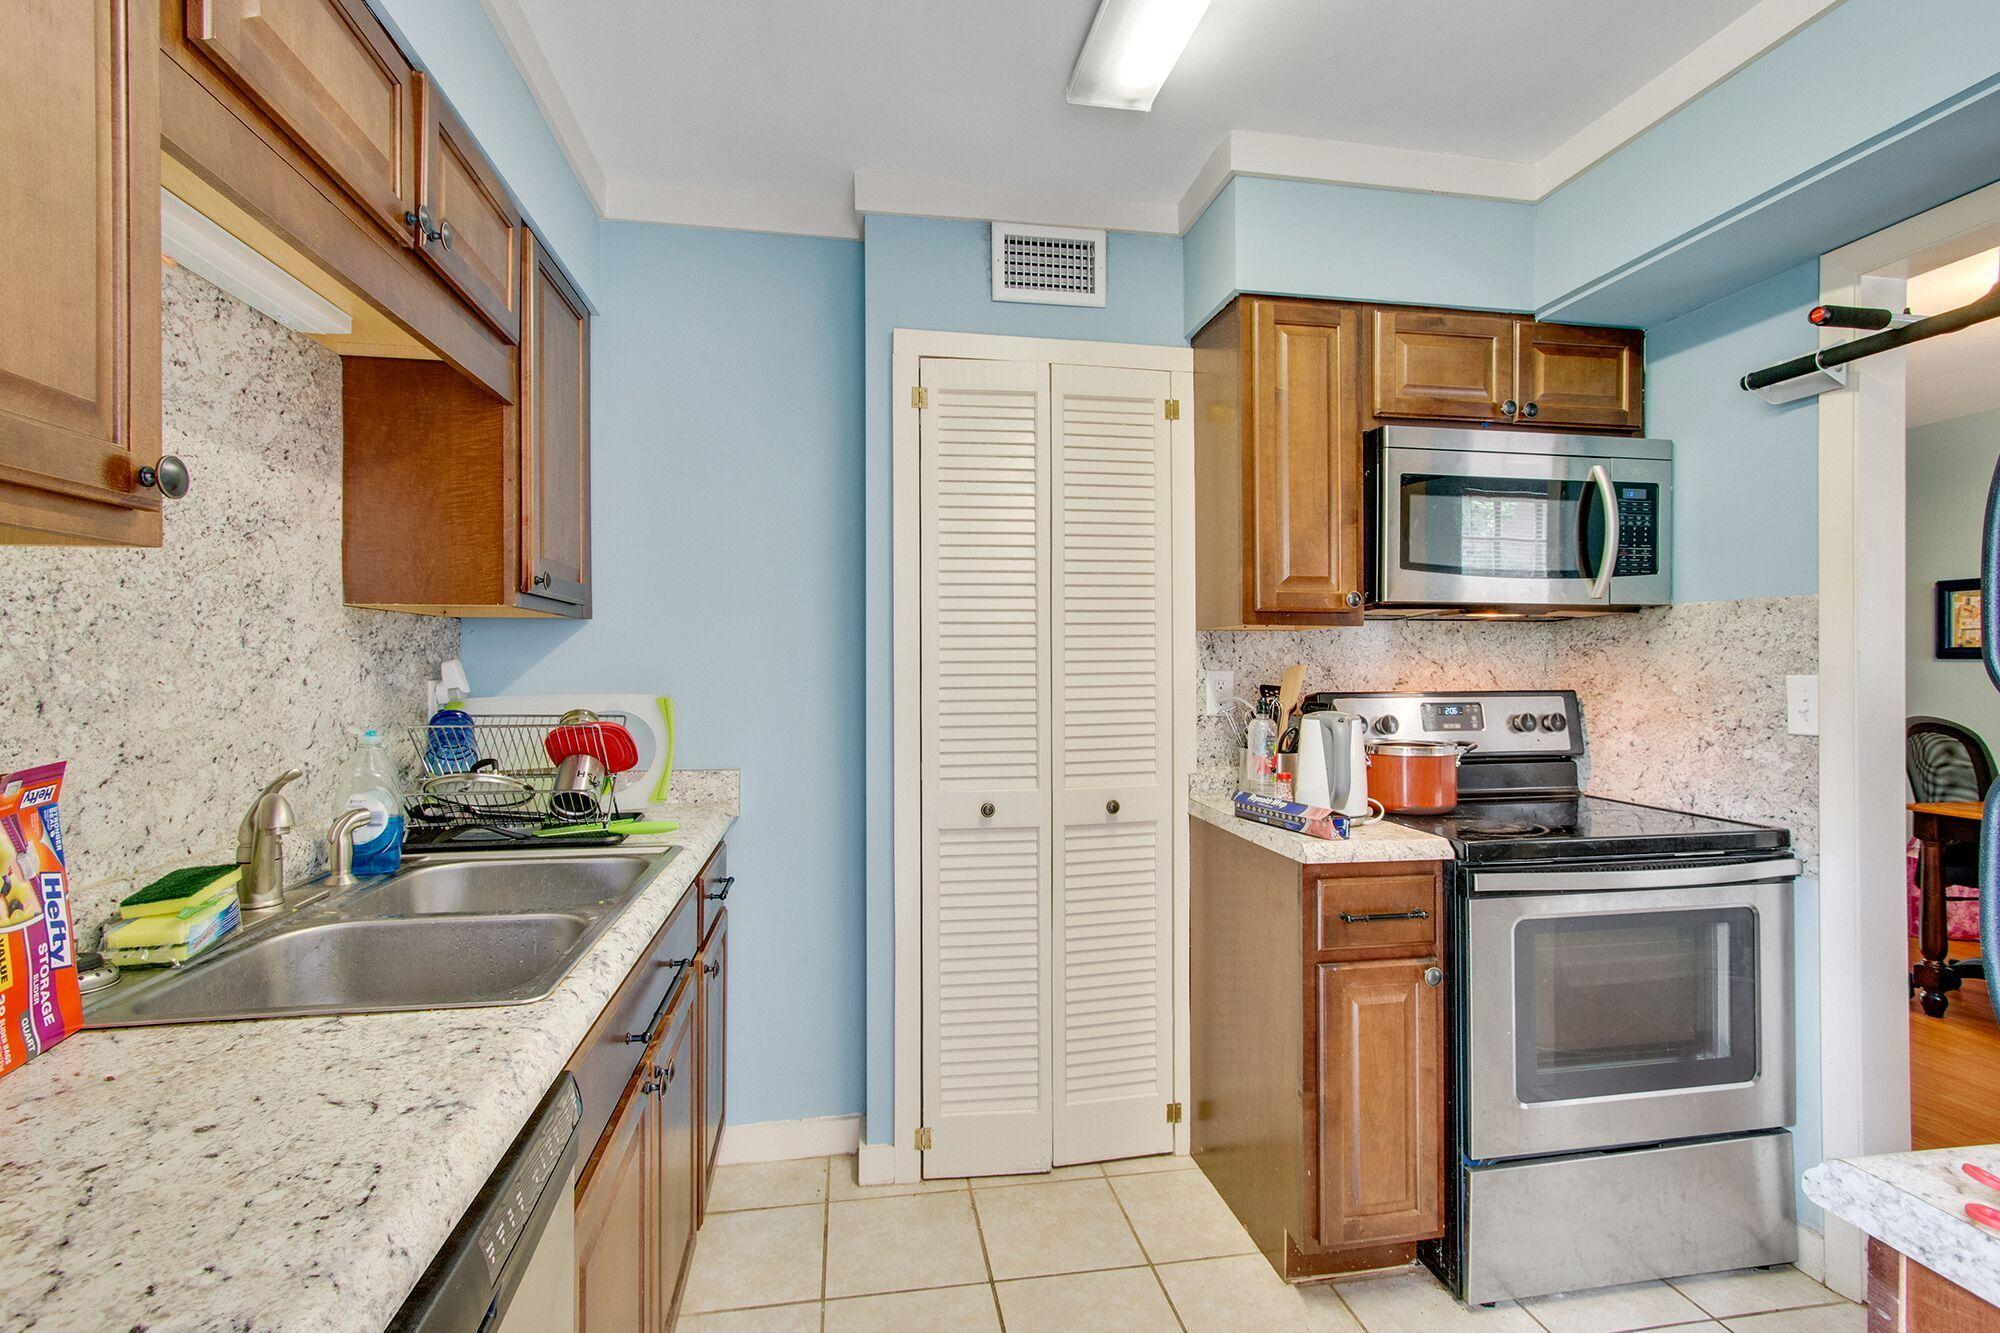 Rutledge Green Condos For Sale - 173 Rutledge, Charleston, SC - 13